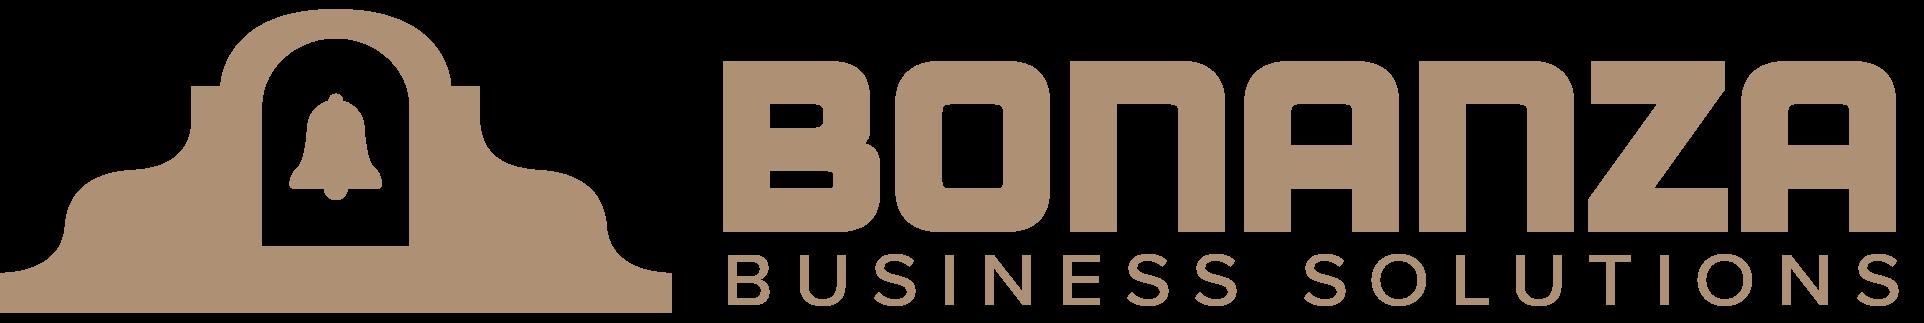 Bonanza_Business_Solutions_Web_Logo.png